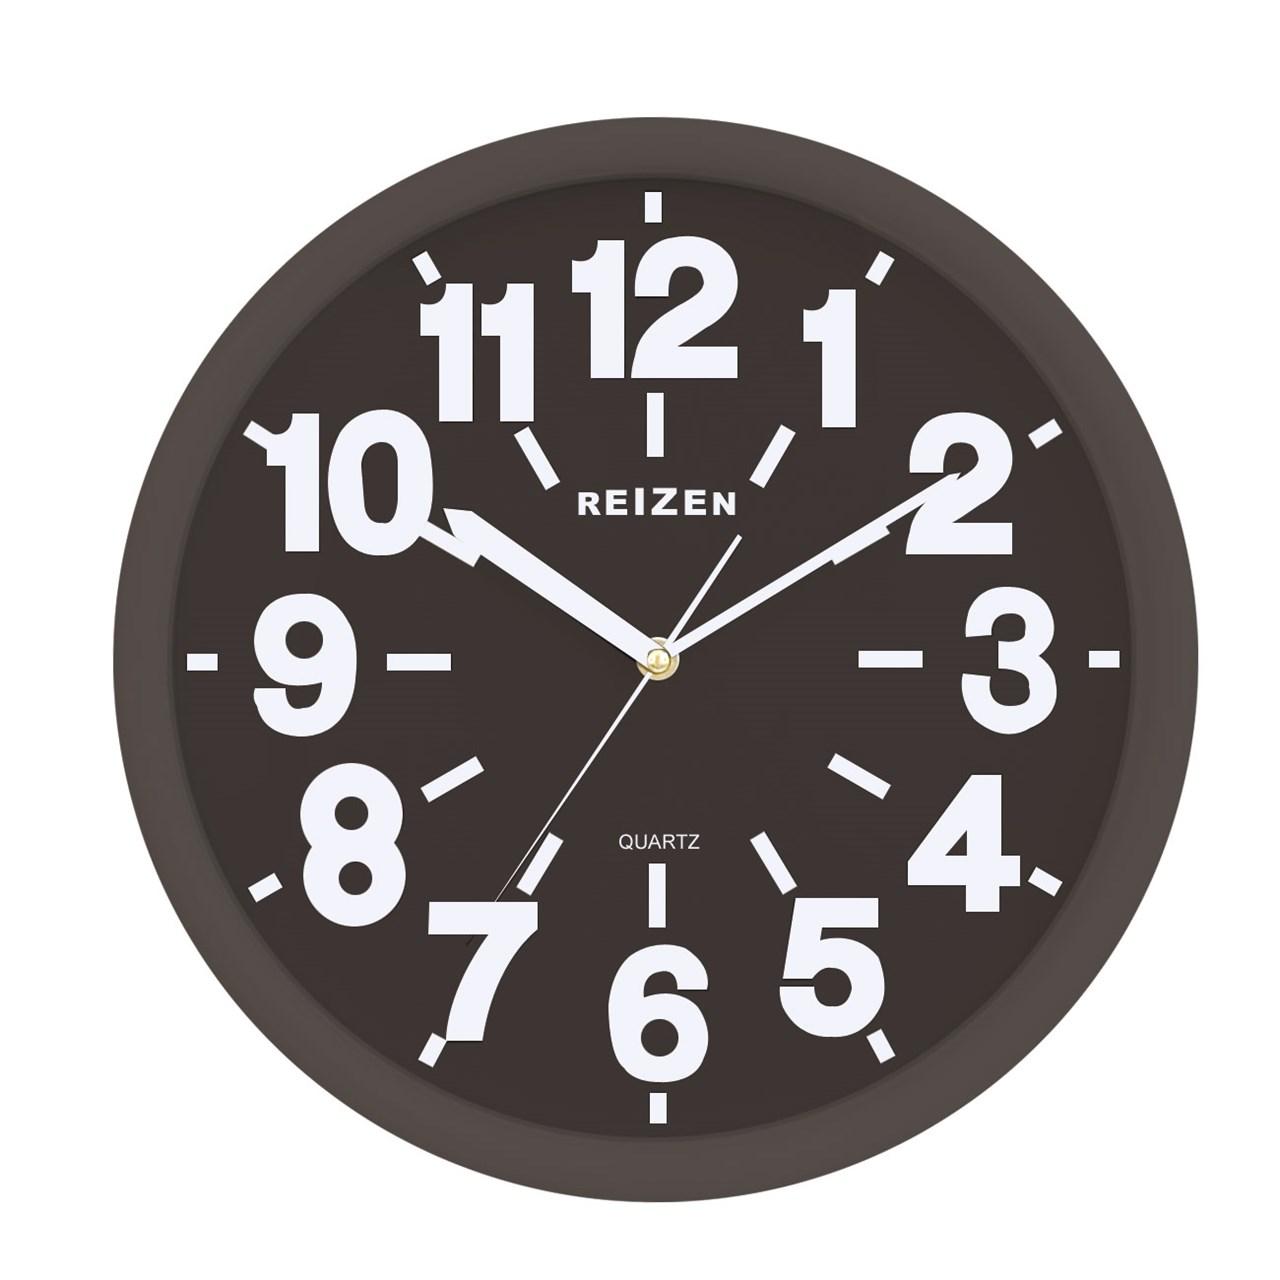 Maxiaids Reizen Low Vision Quartz Wall Clock Black Face